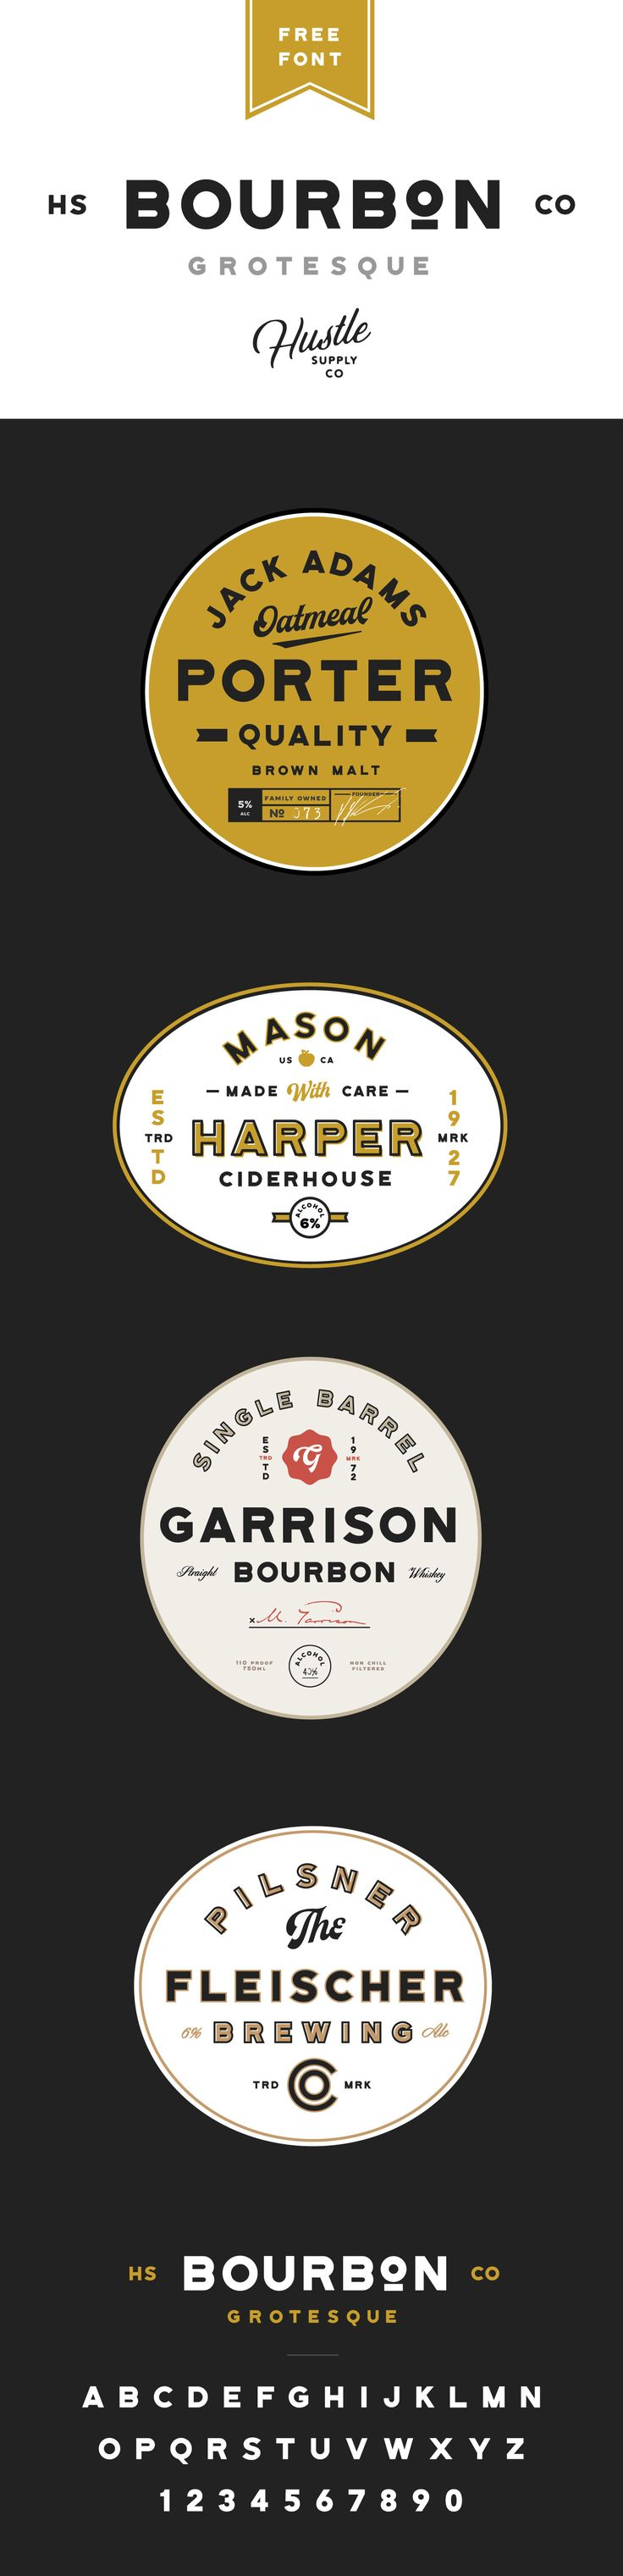 Bourbon Grotesque is a free versatile sans serif typeface - Available on my website!http://jeremyvessey.com/bourbon-grotesque/